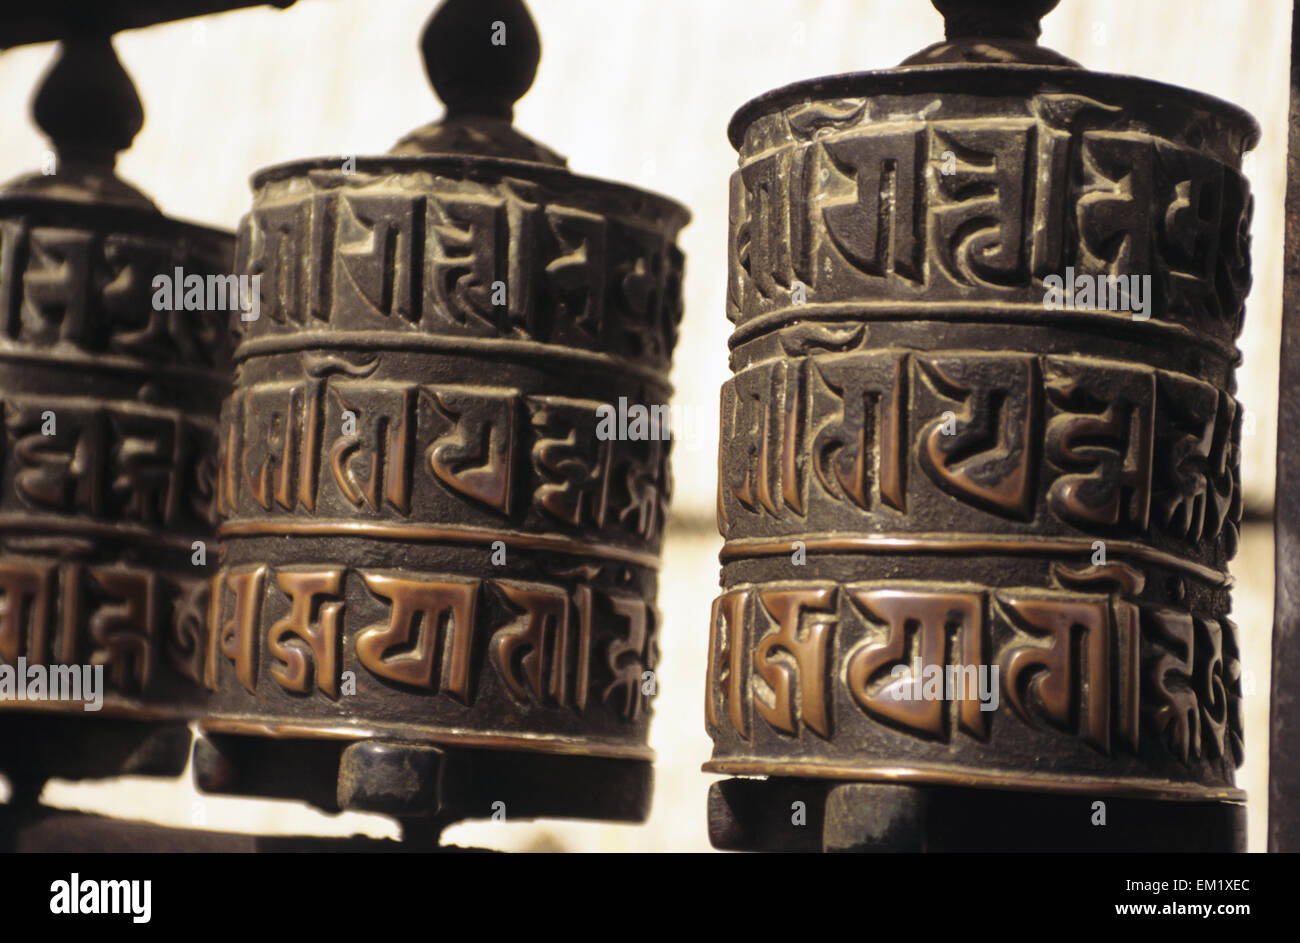 Nepal, Swayambhunath Temple; Kathmandu, Close-up of prayer wheels with carvings - Stock Image